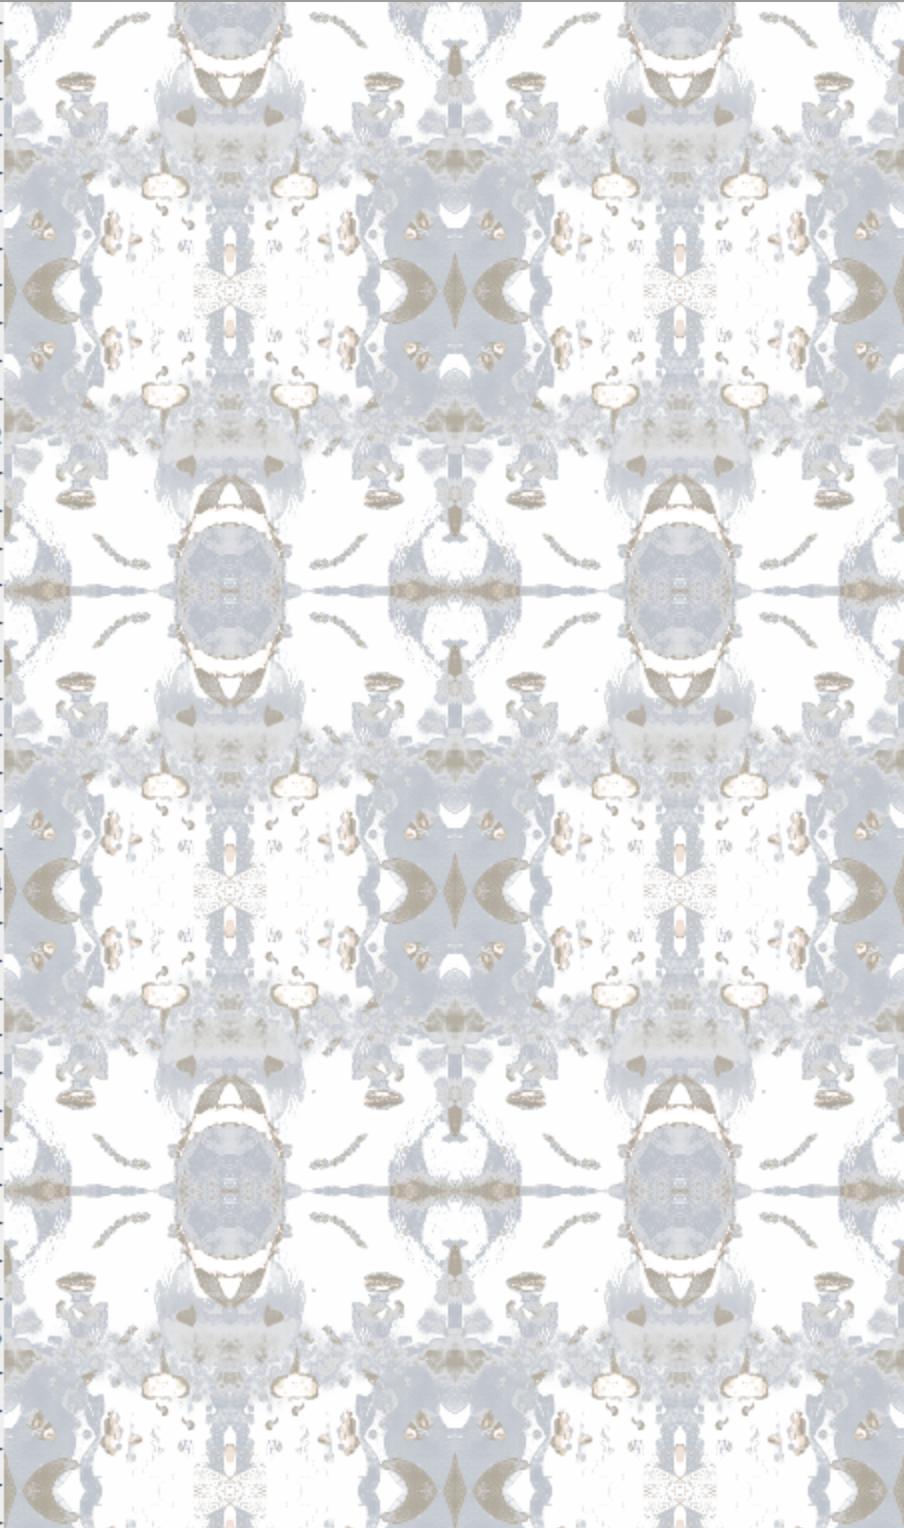 Luna Pale Gray/Blue – Jennifer Latimer Prepasted Wallpaper, Blue Grey, Indigo,